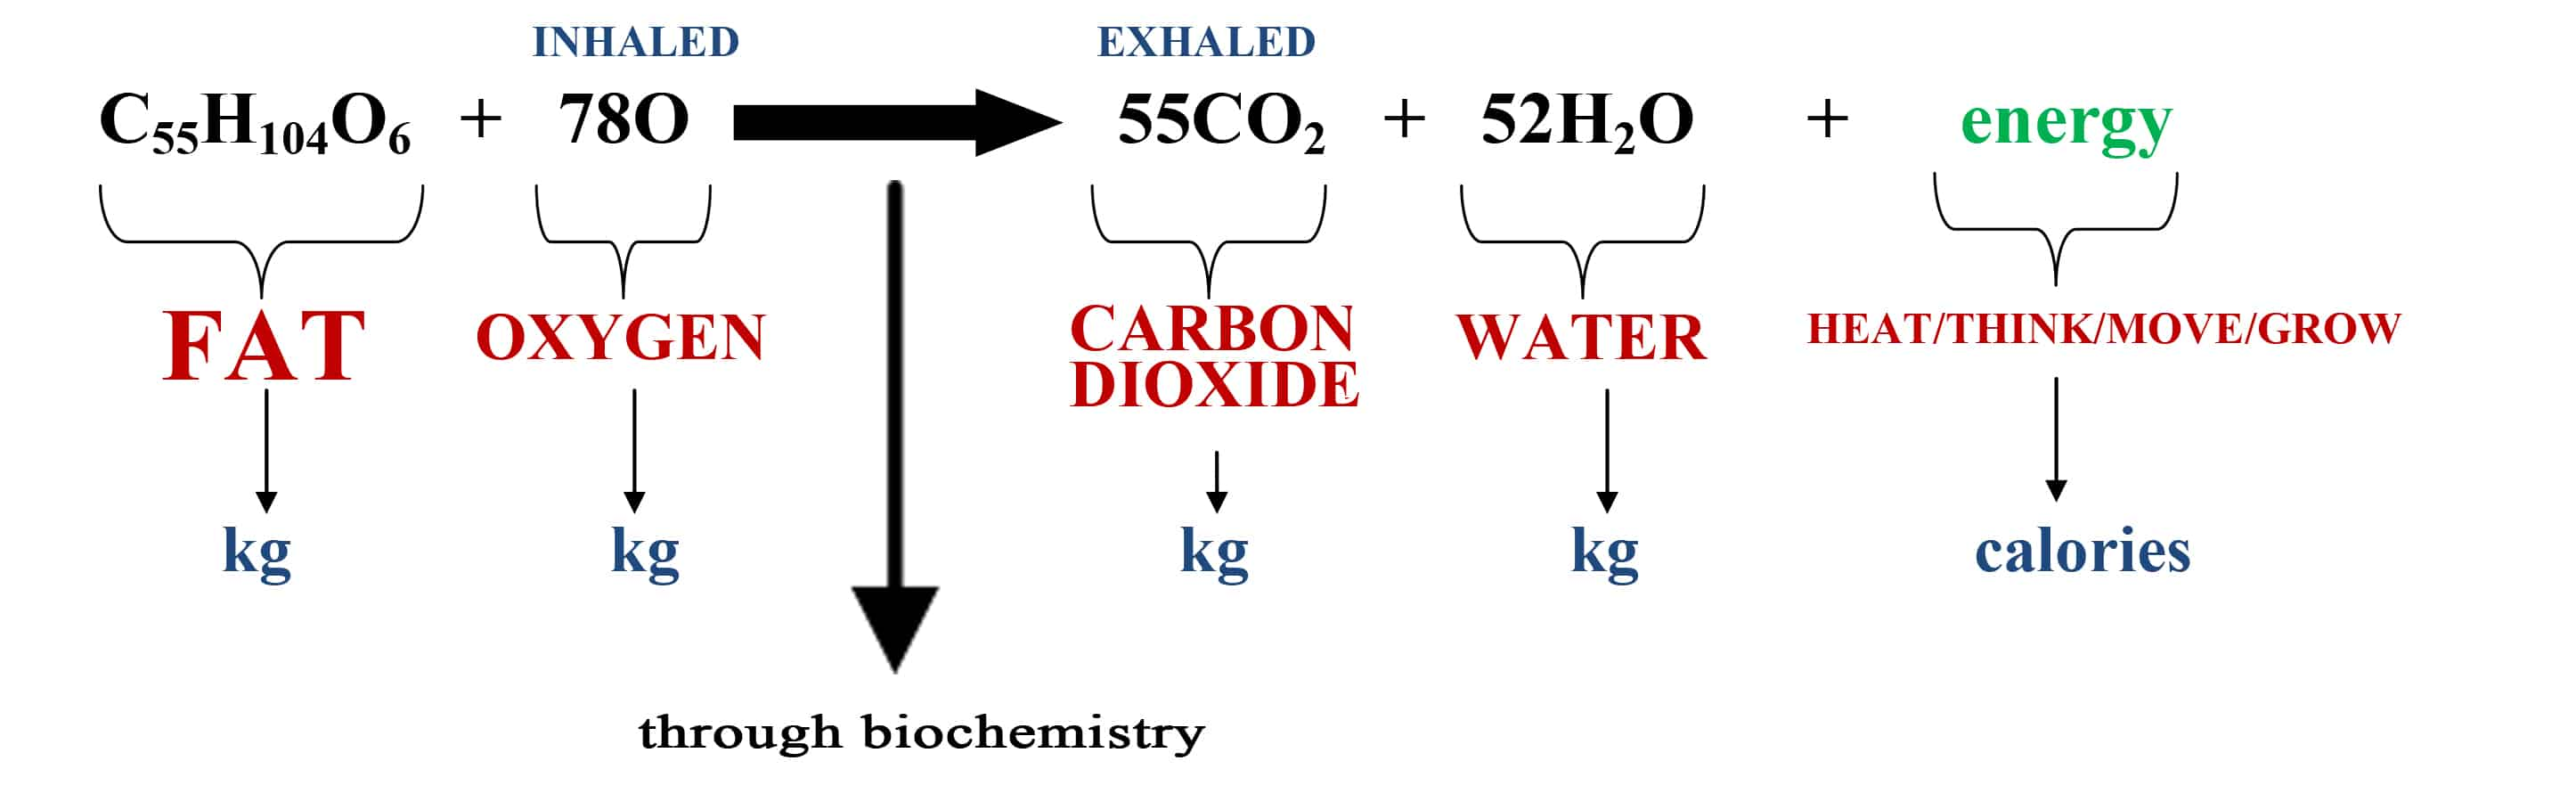 body fat chemical formula